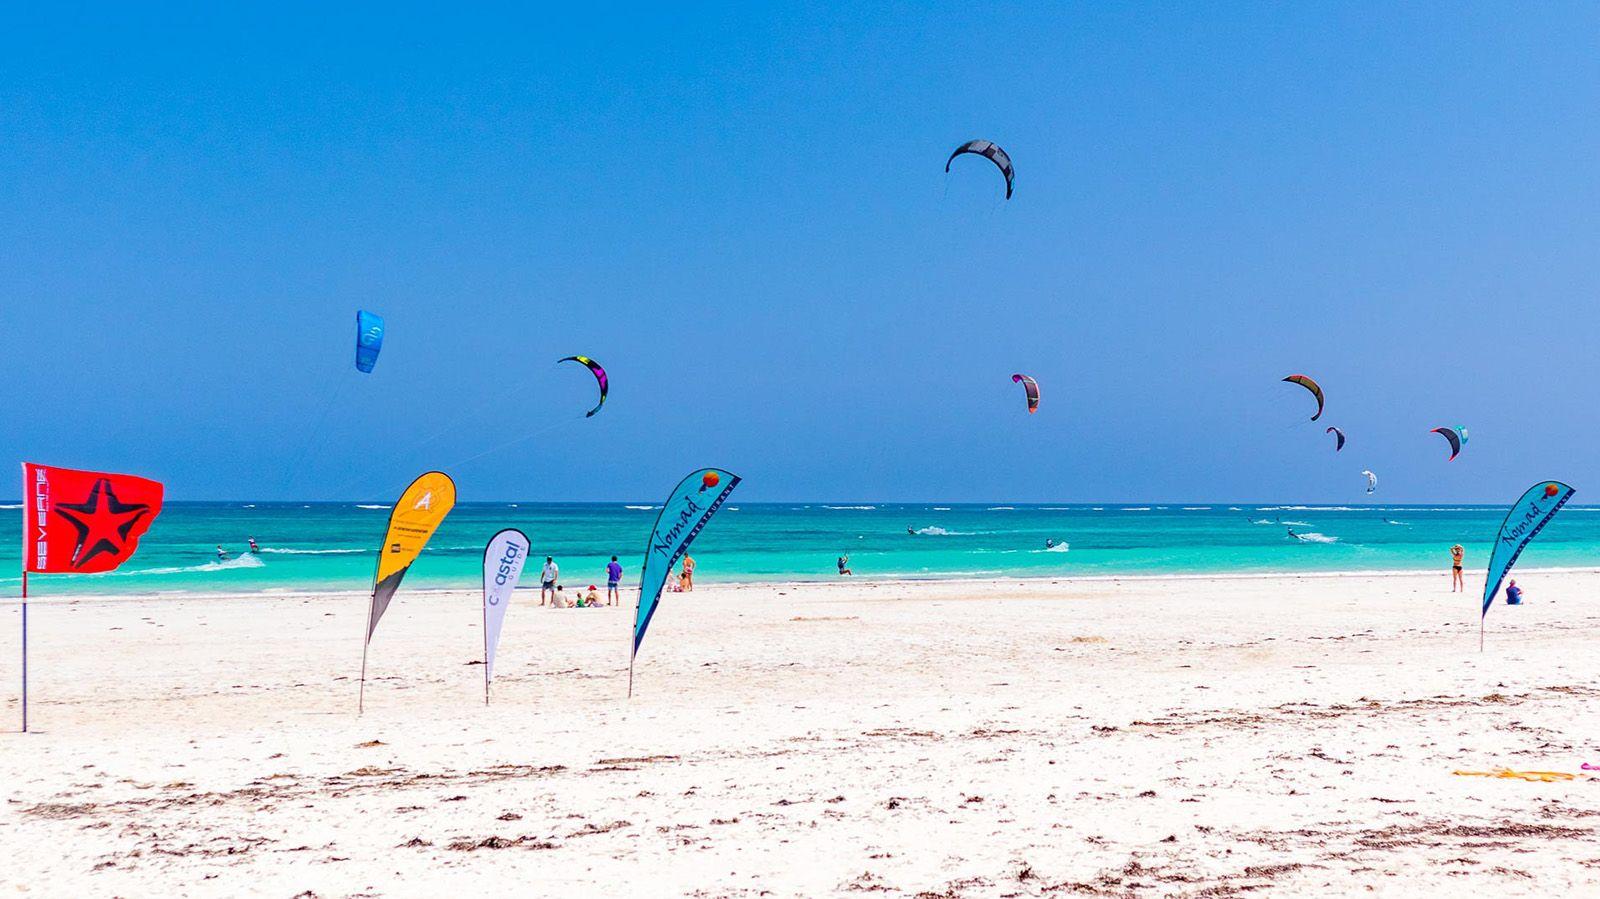 Kenya Kite surf Cup